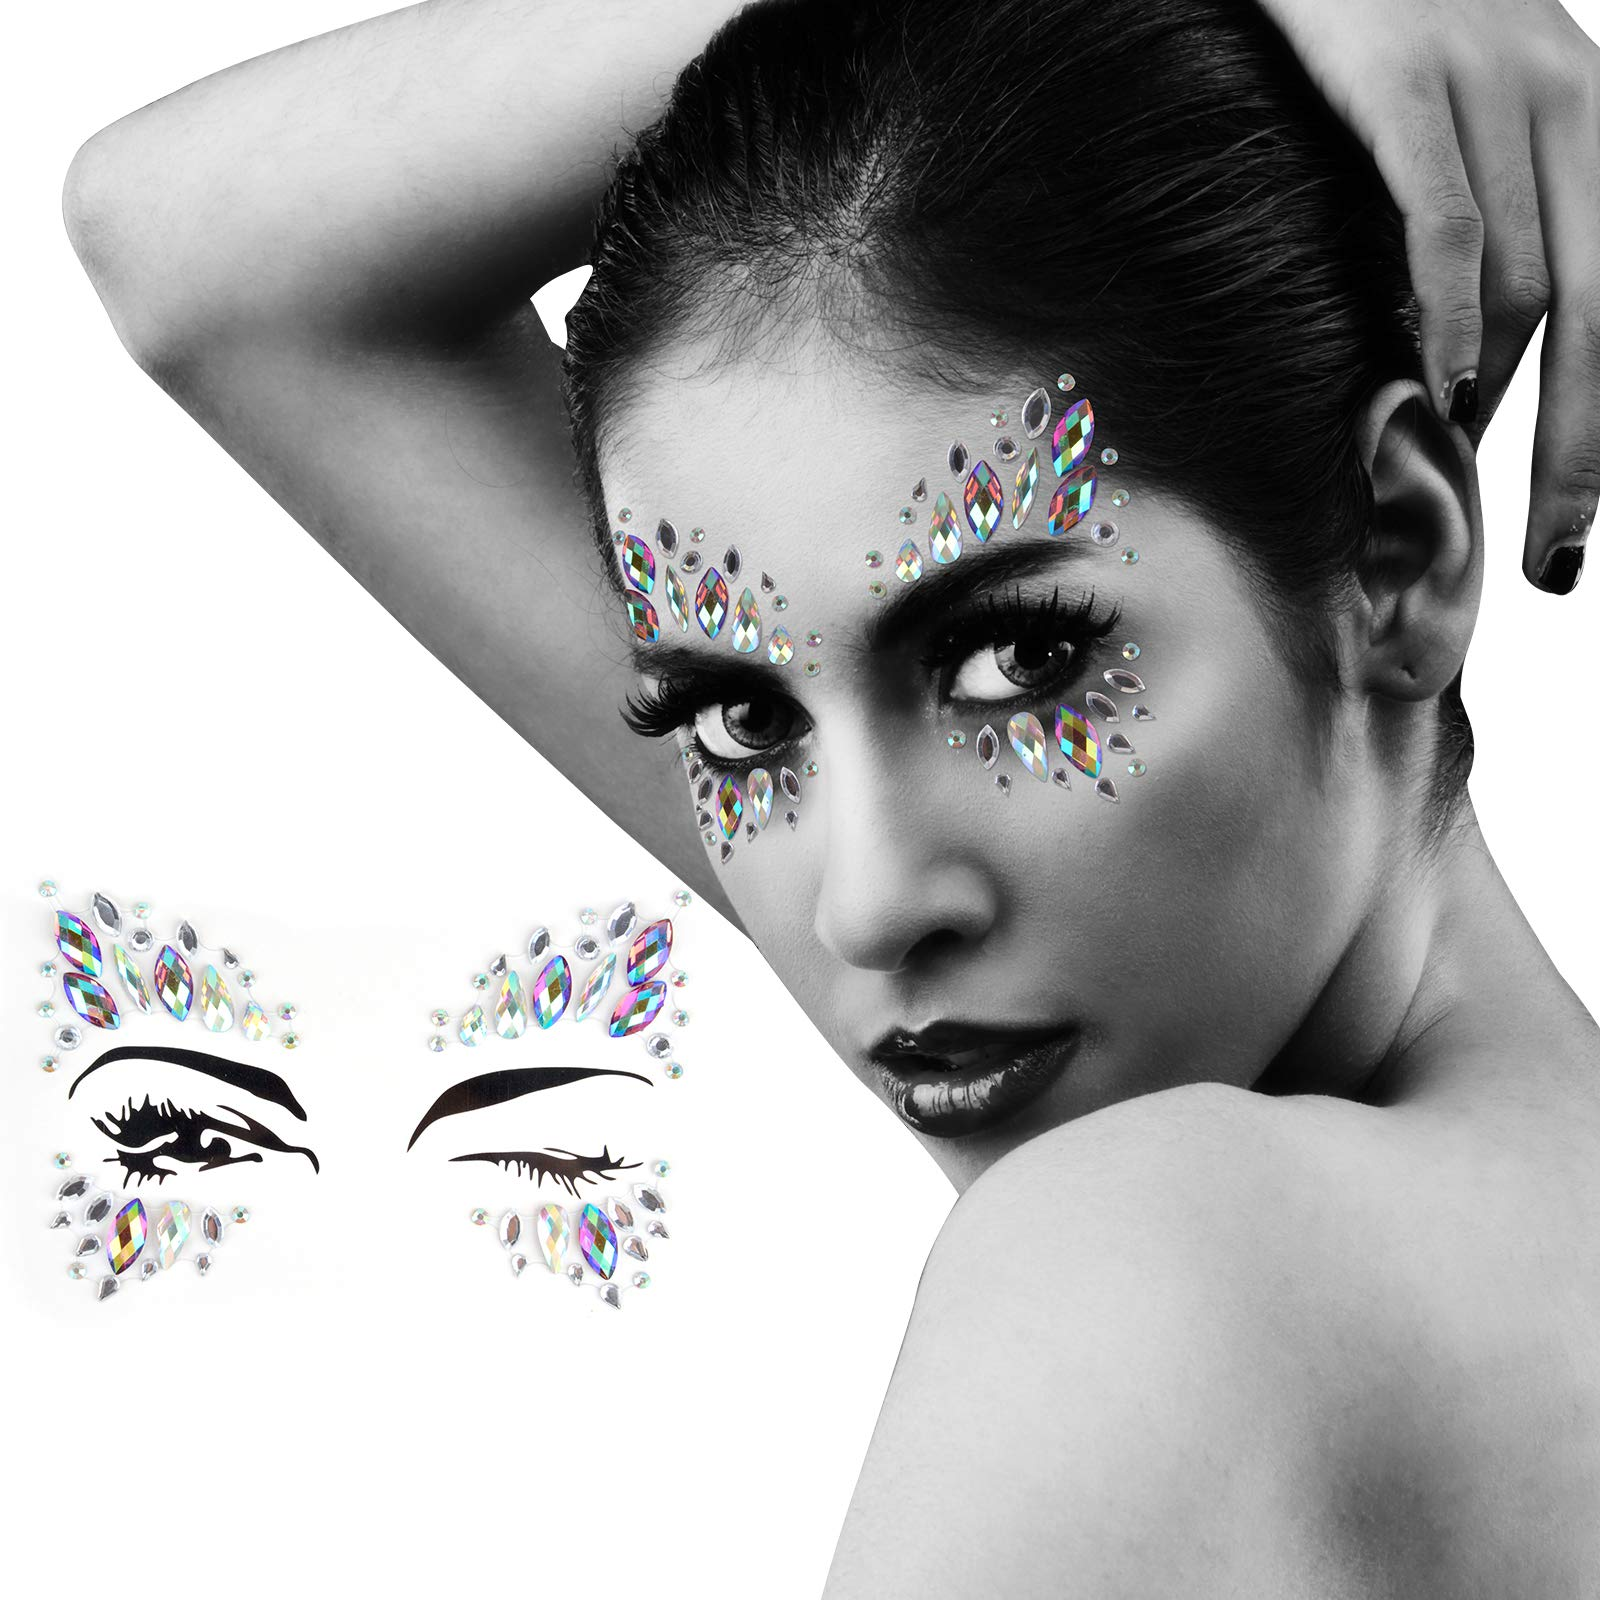 Body Tattoo Sticker, Fascigirl 4 BohemianRhinestone Crystal Mermaid TearsStickers Halloween Rave Party FestivalMetallic Shiny Gems Glitter TemporaryFace Body Tattoos Jewels